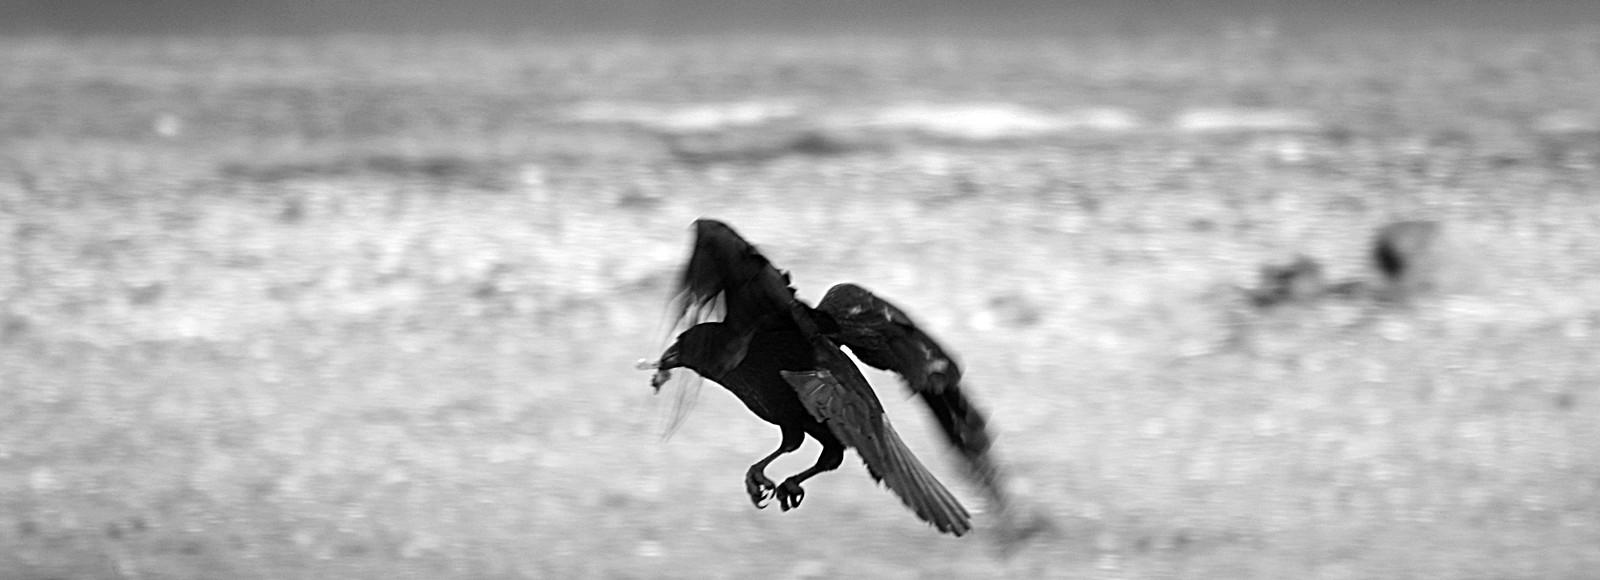 A raven on a beach